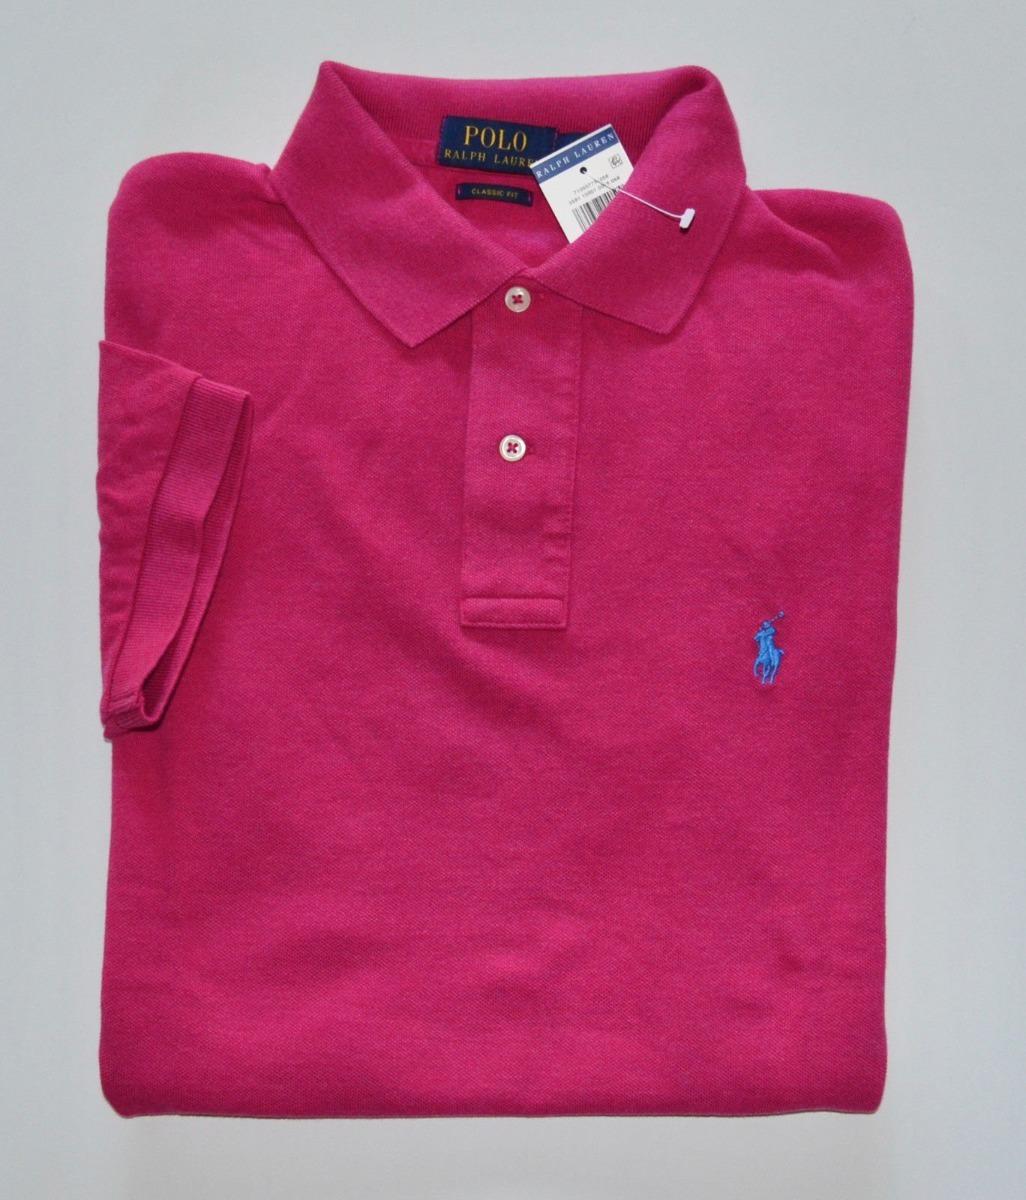 camisa polo ralph lauren tamanho g   l original custom fit. Carregando zoom. af73f73a906db